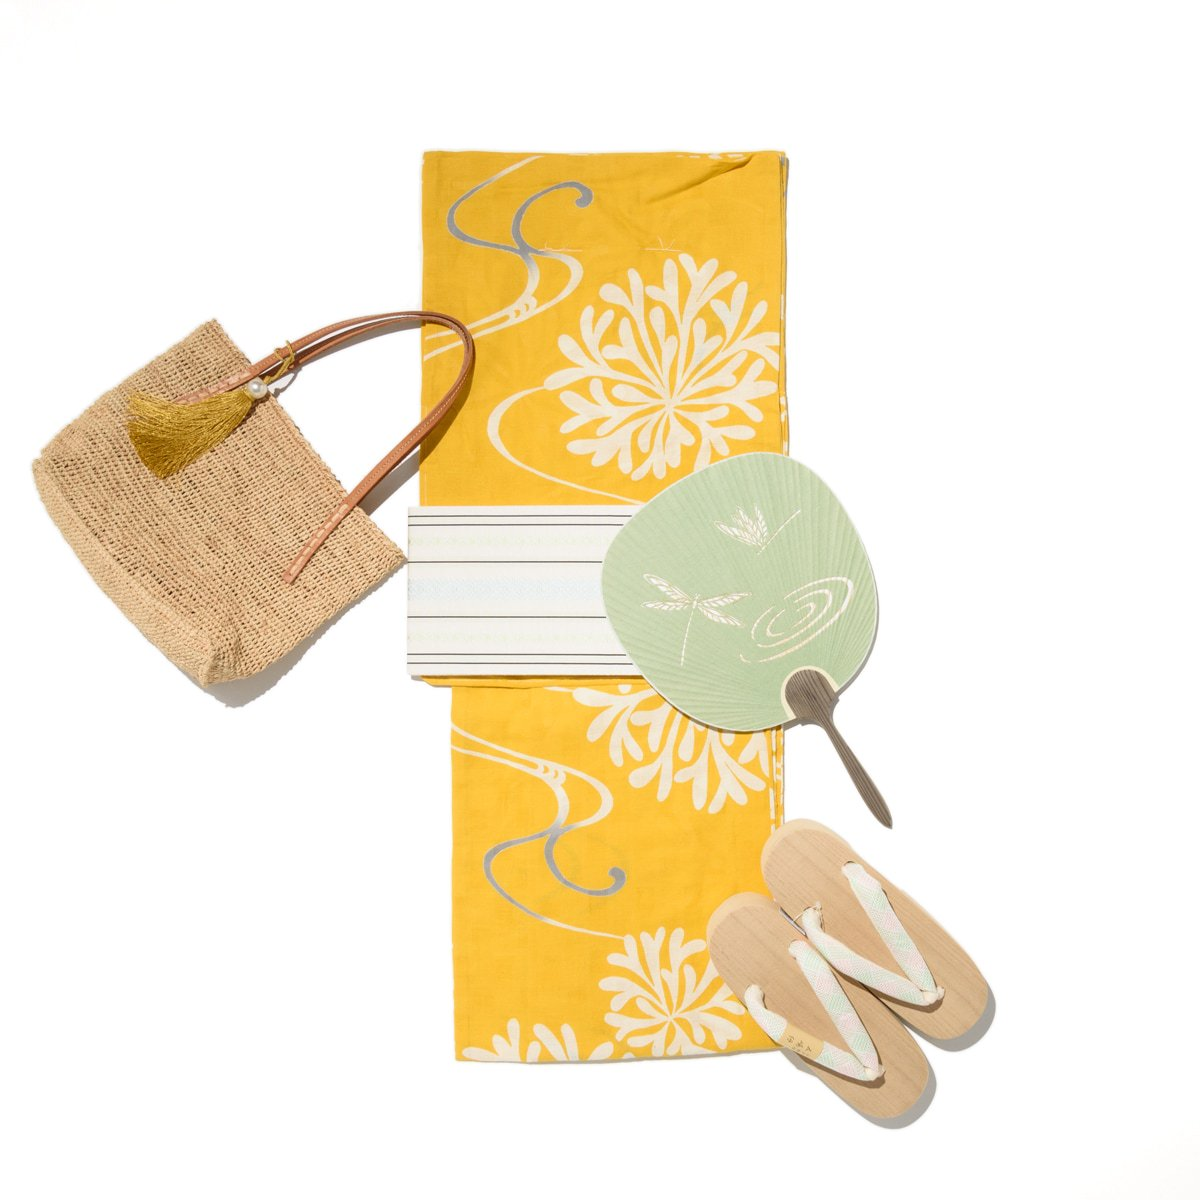 「新品浴衣 海松 ViVi」の商品画像